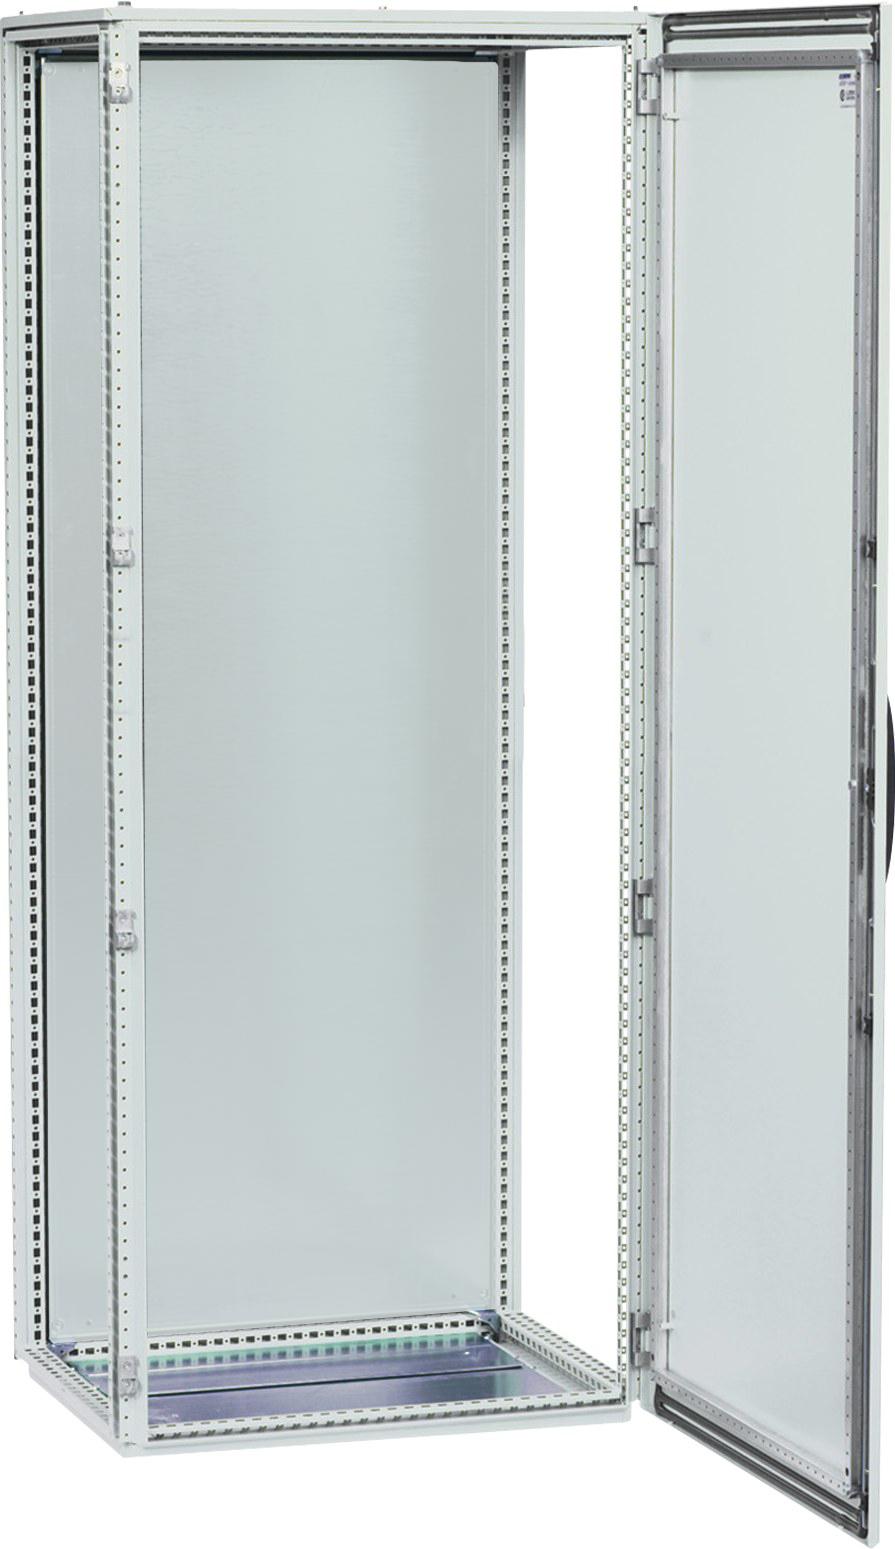 1 Stk Anreihschrank 1-türig, 2000x800x400mm, RAL 7035 AS208041-5